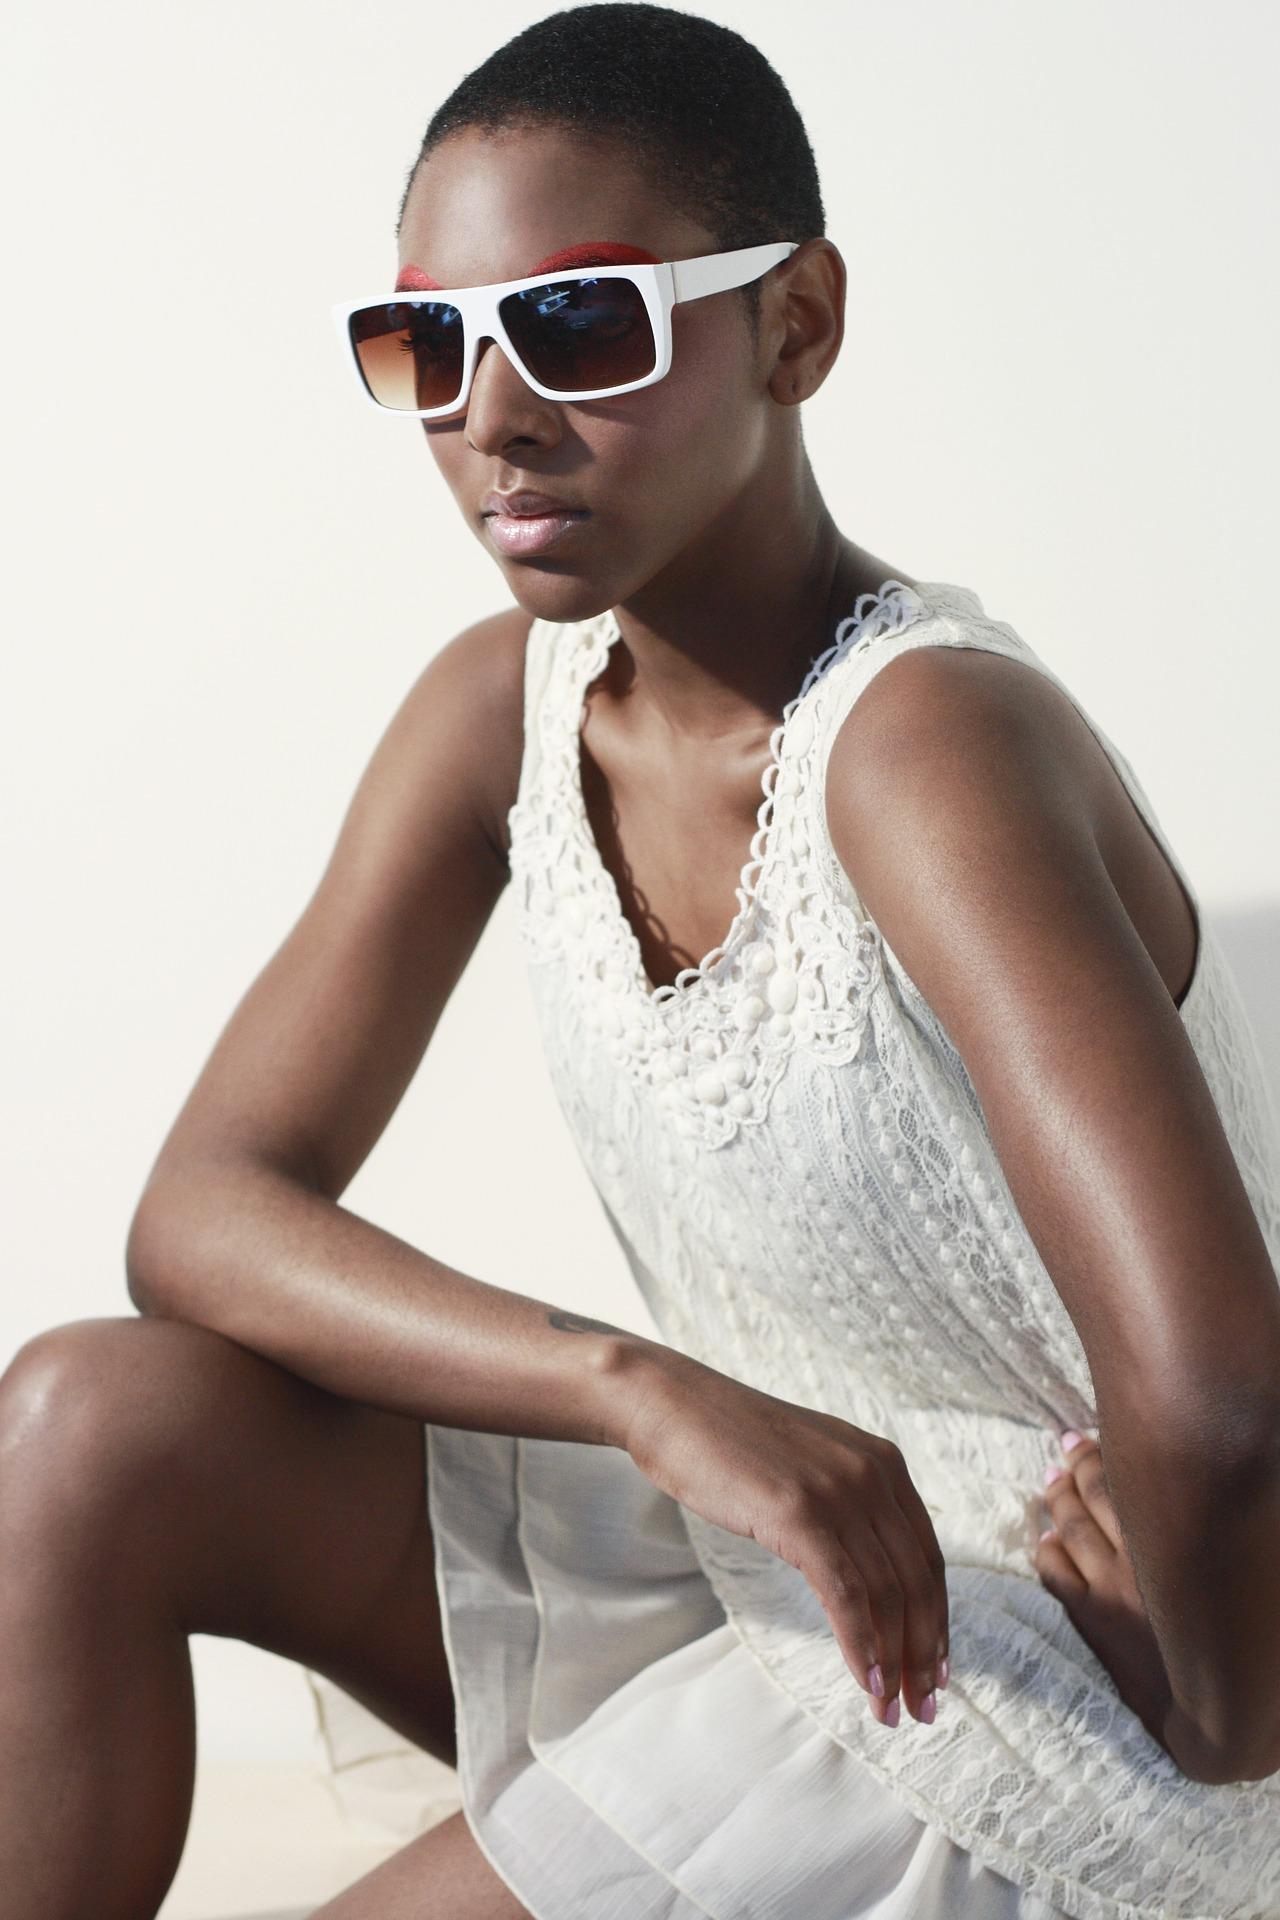 sunglasses-1547492_1920.jpg